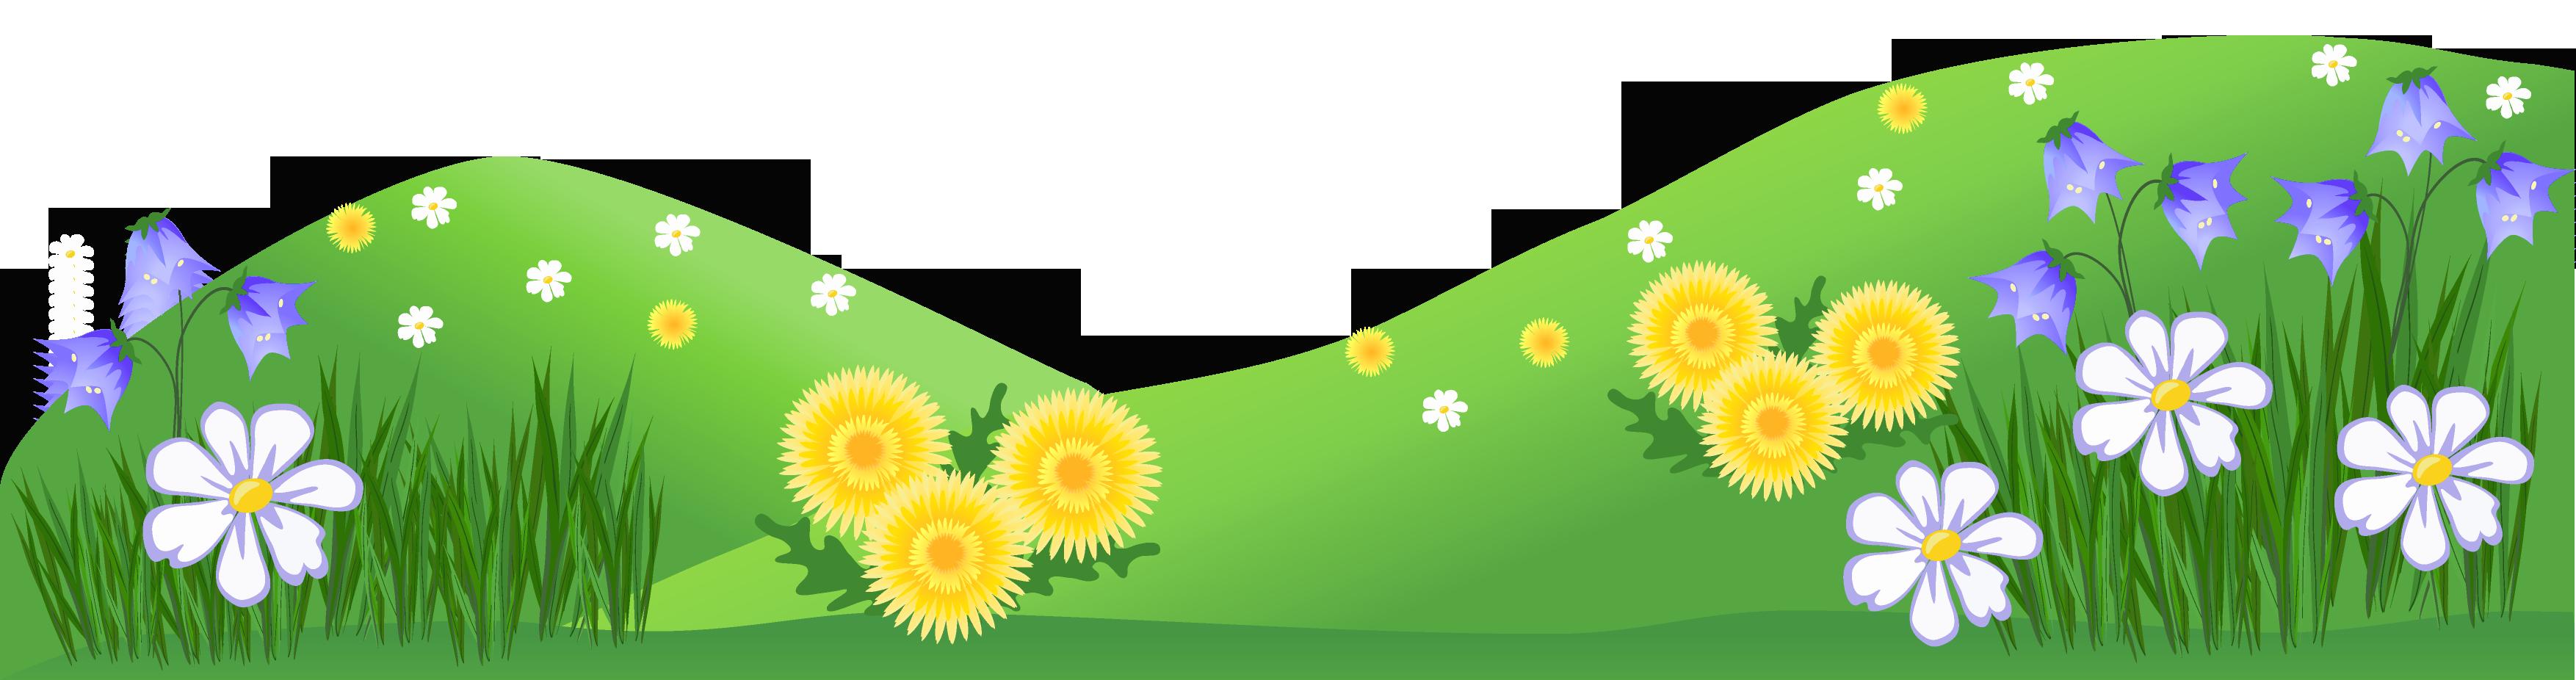 Free Grass Field Cliparts, Download Free Clip Art, Free Clip.